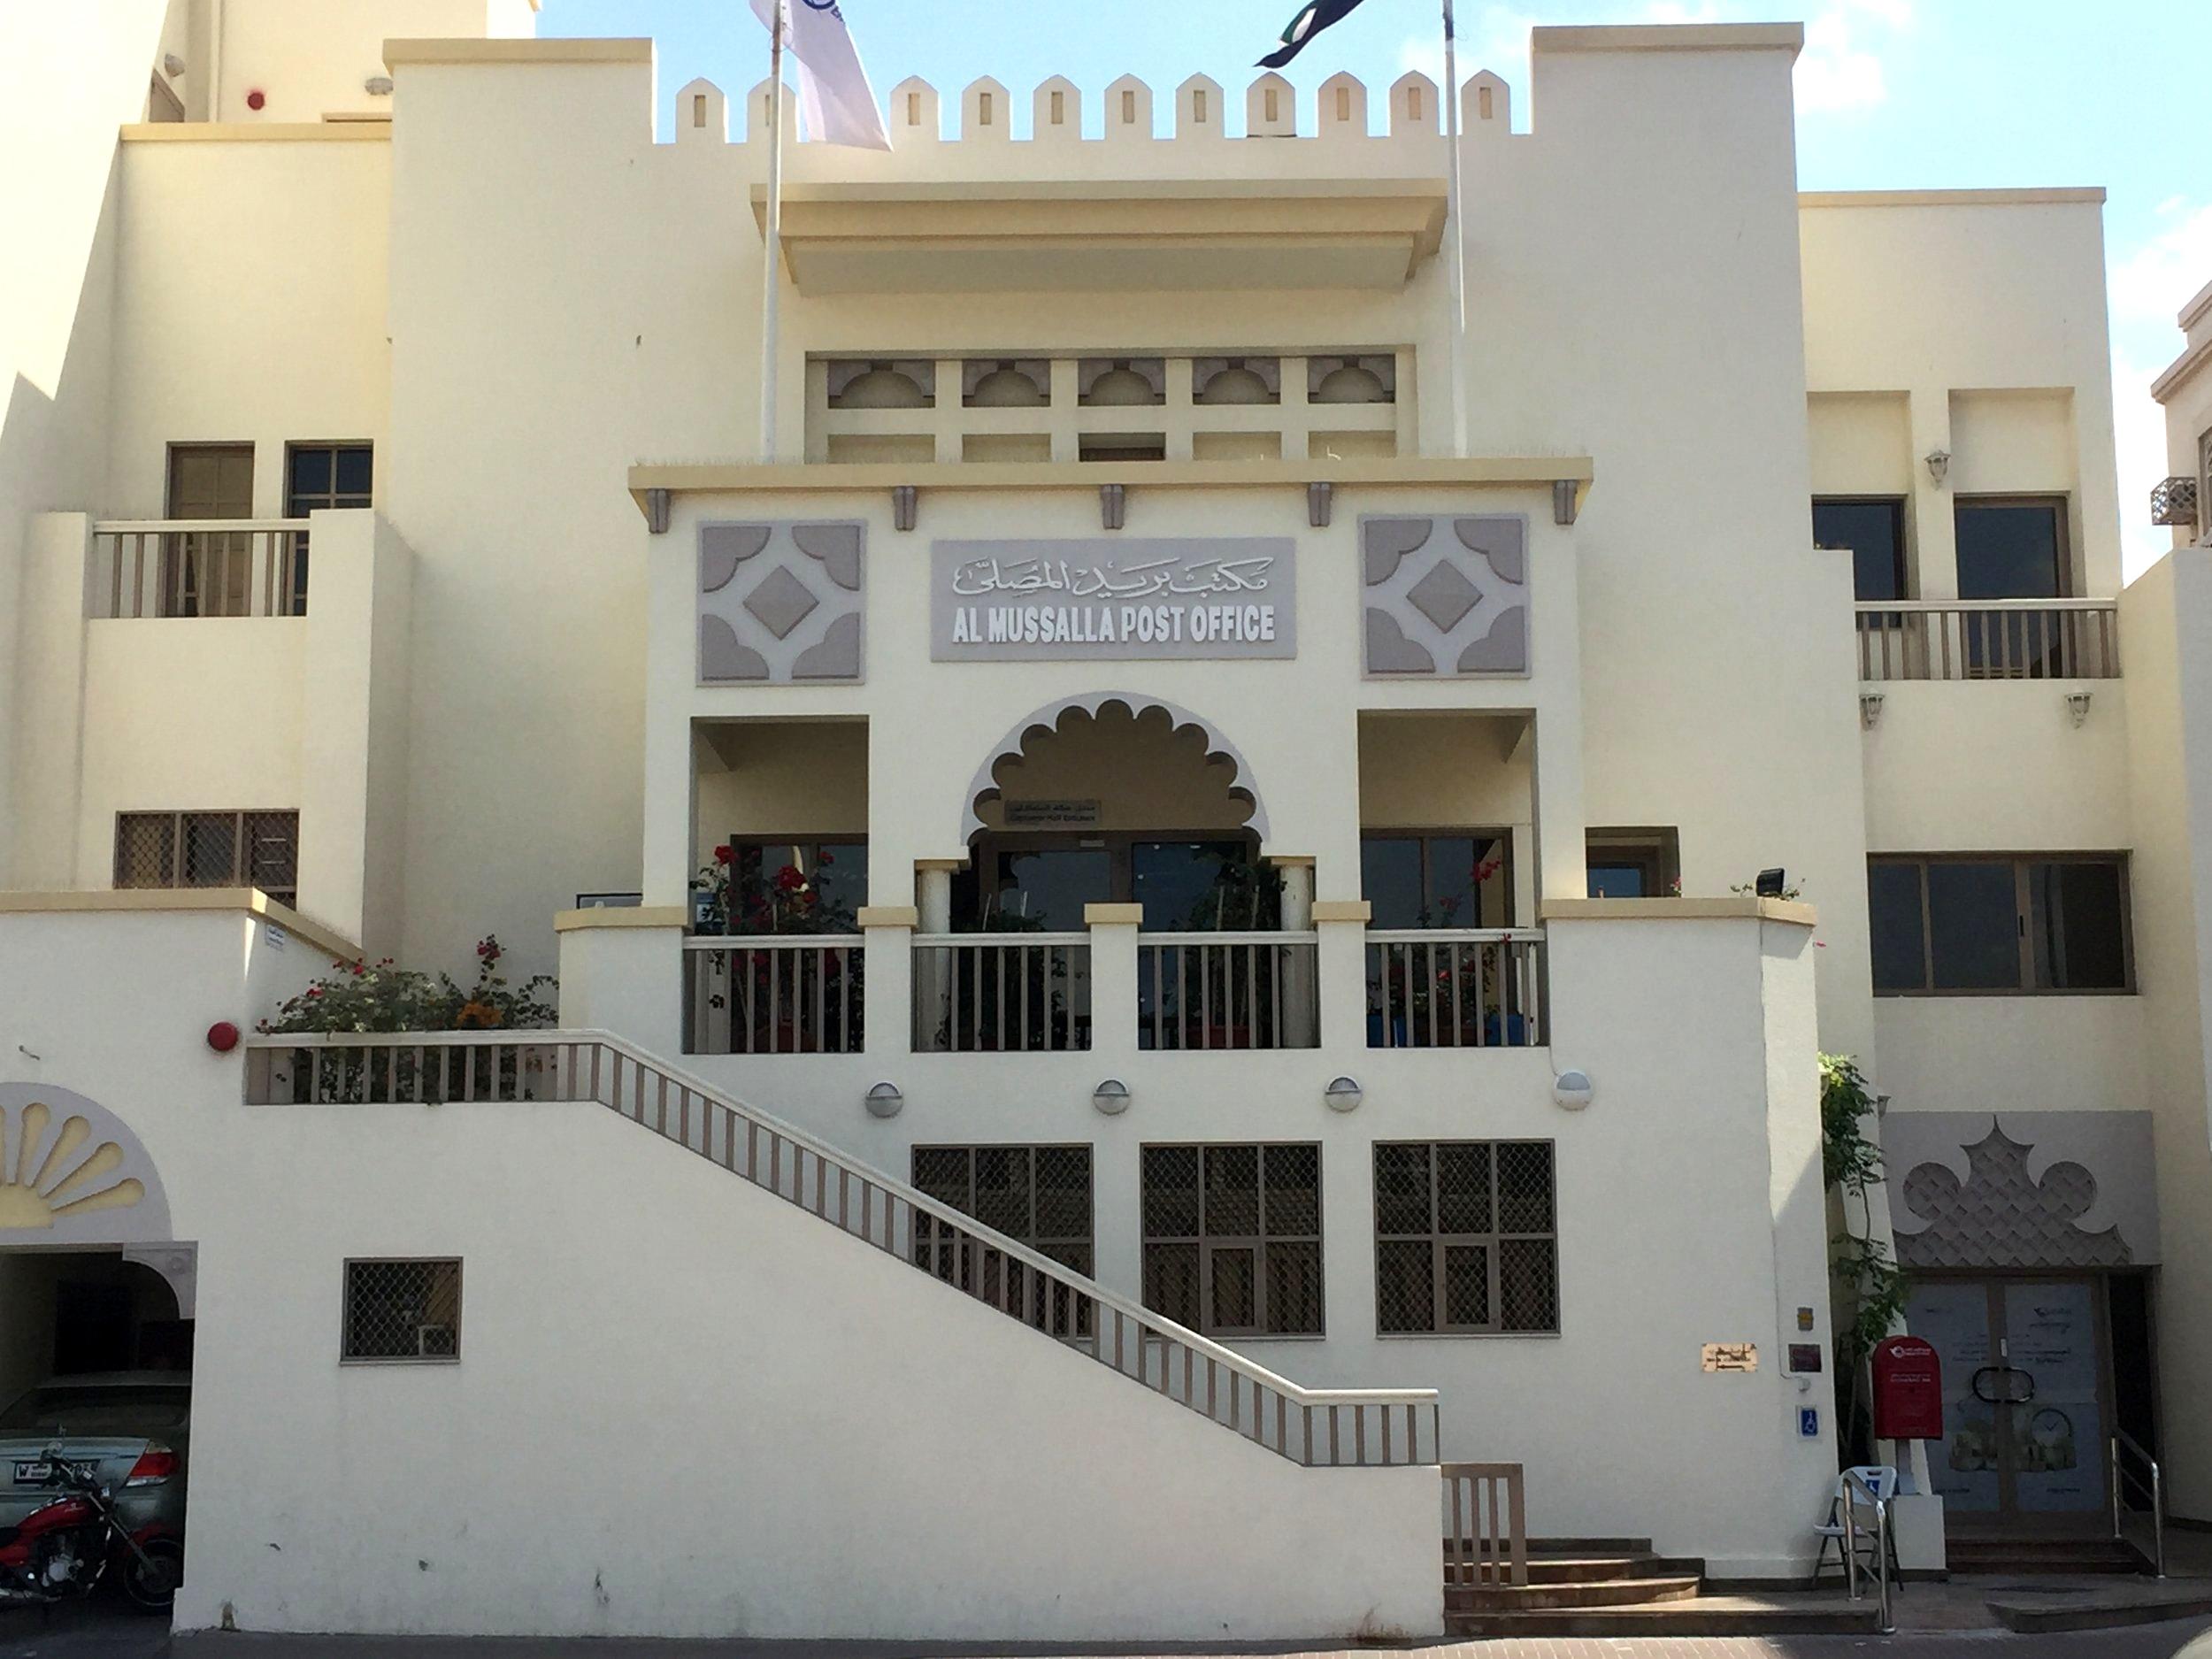 Al Mussallah Post Office